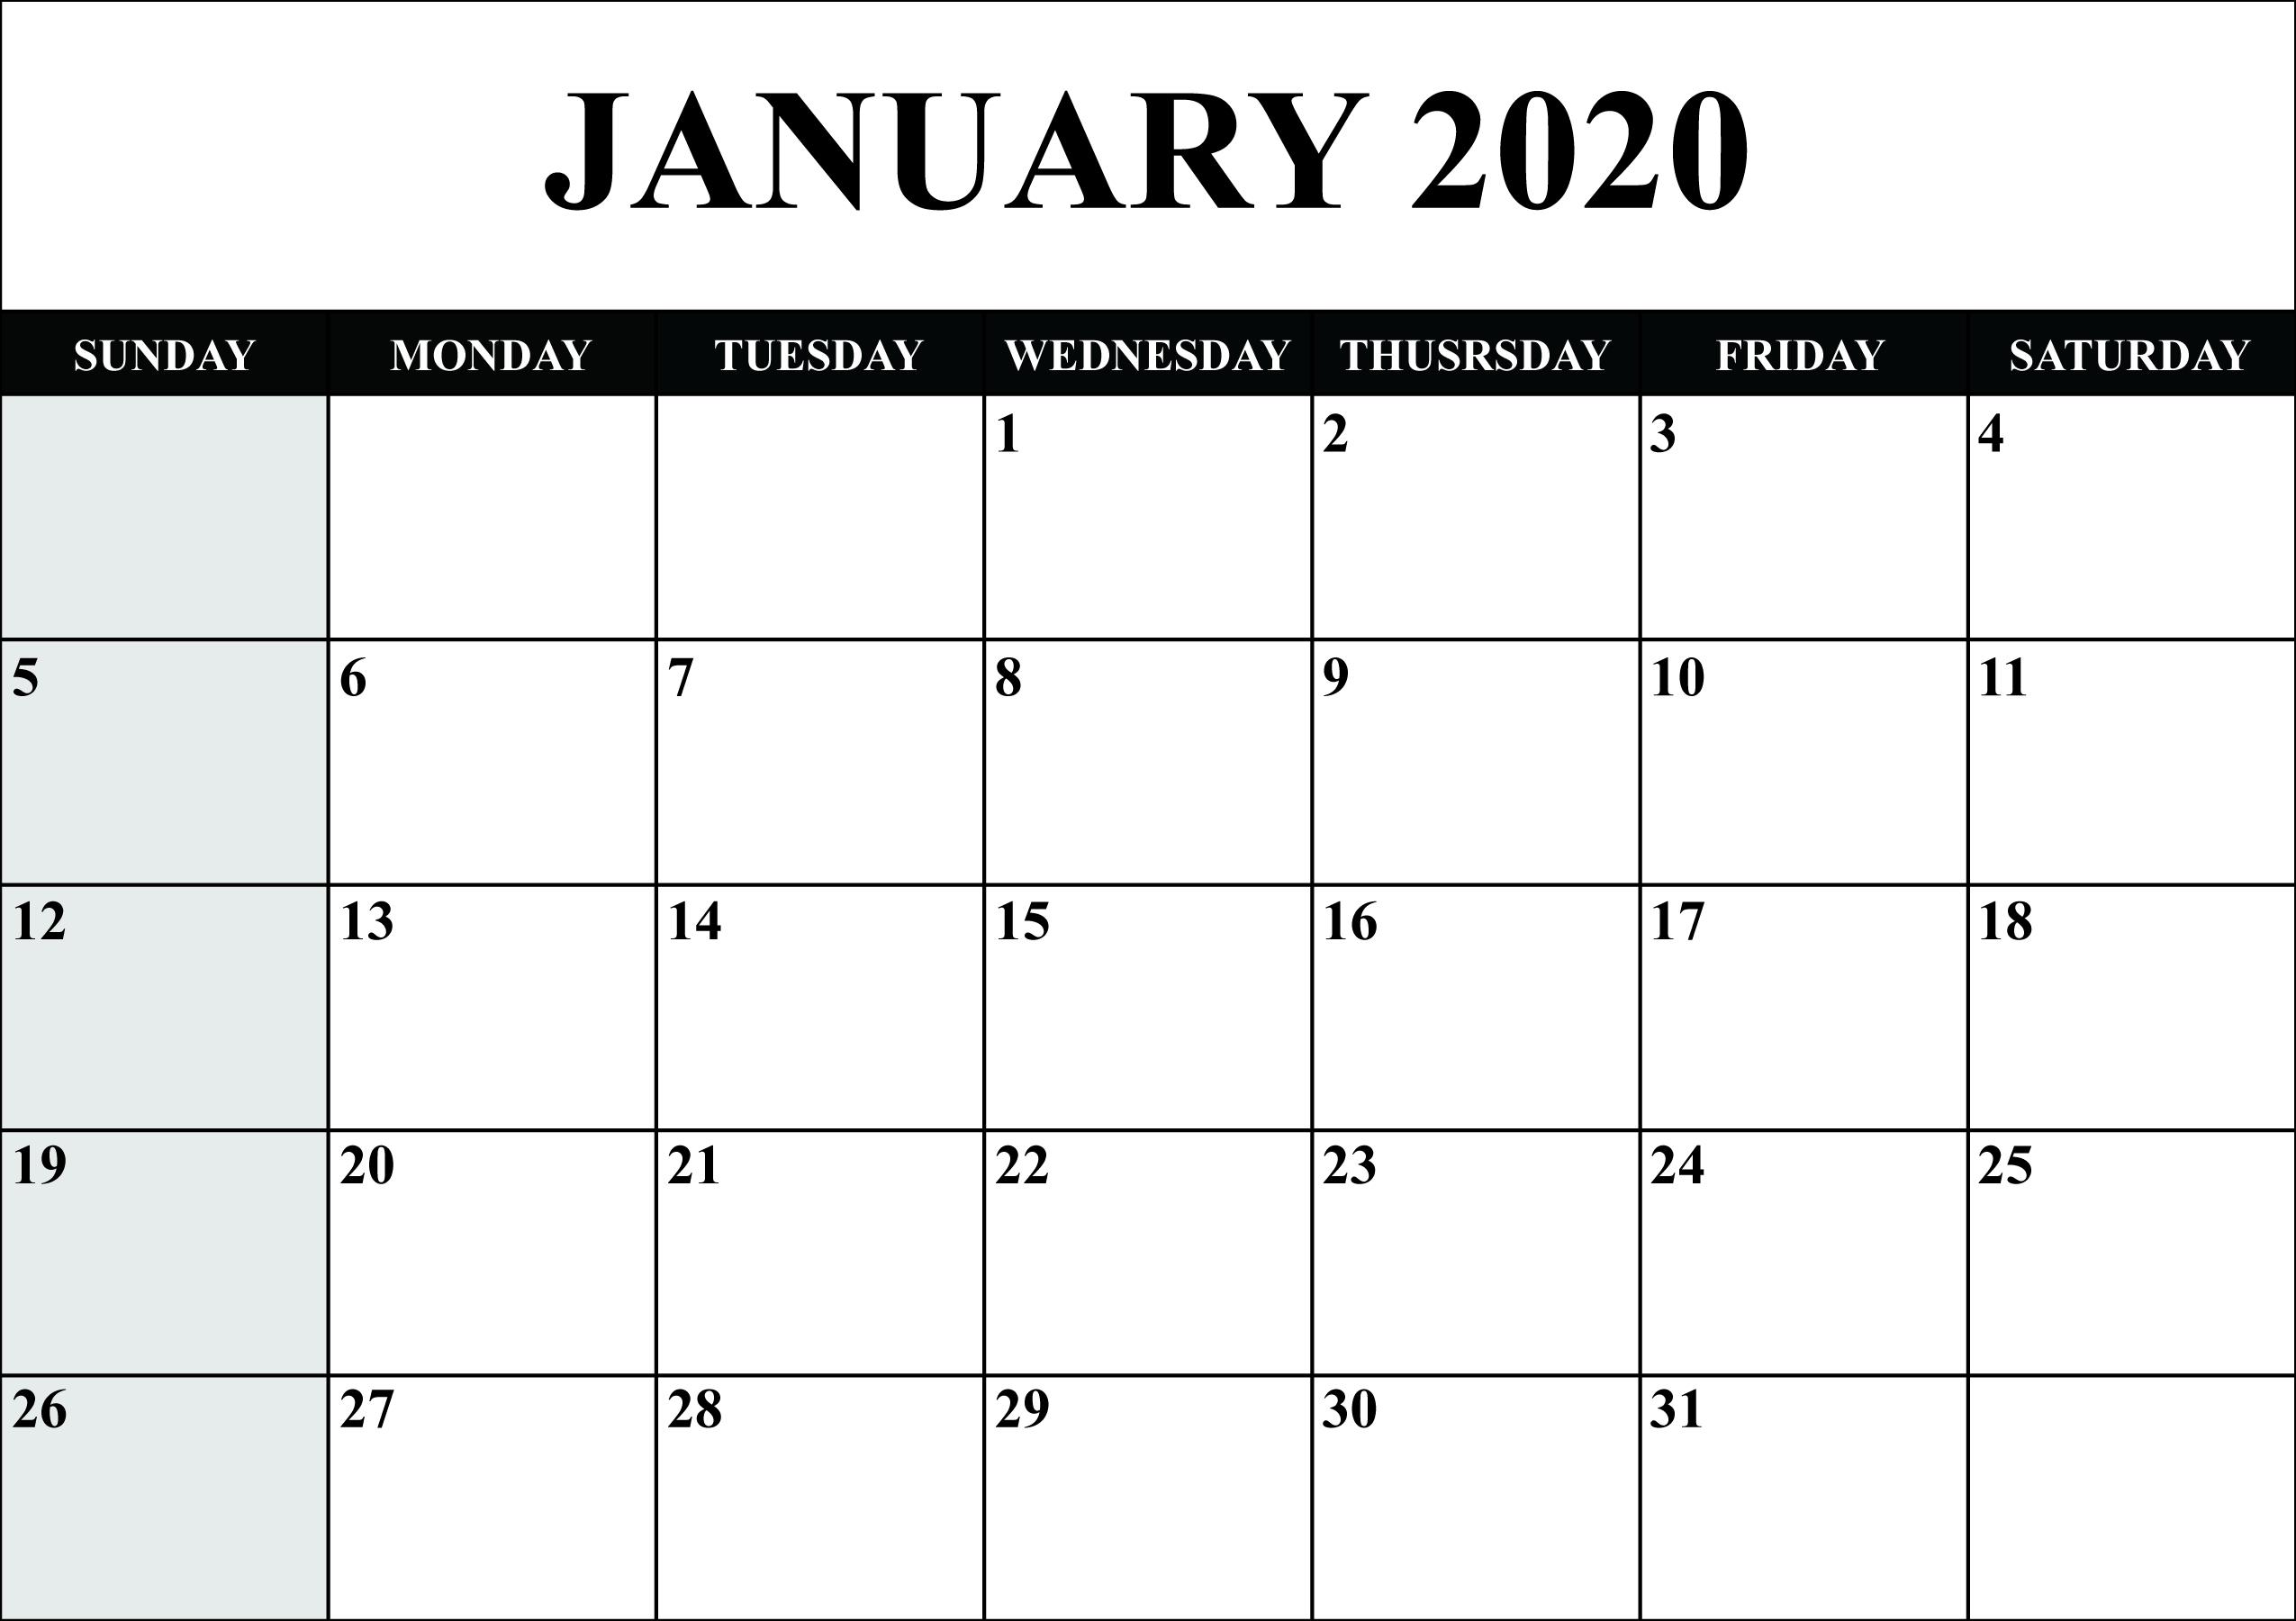 Free Blank January 2020 Calendar Printable In Pdf, Word with regard to Vertex Calendars 2020 Printable